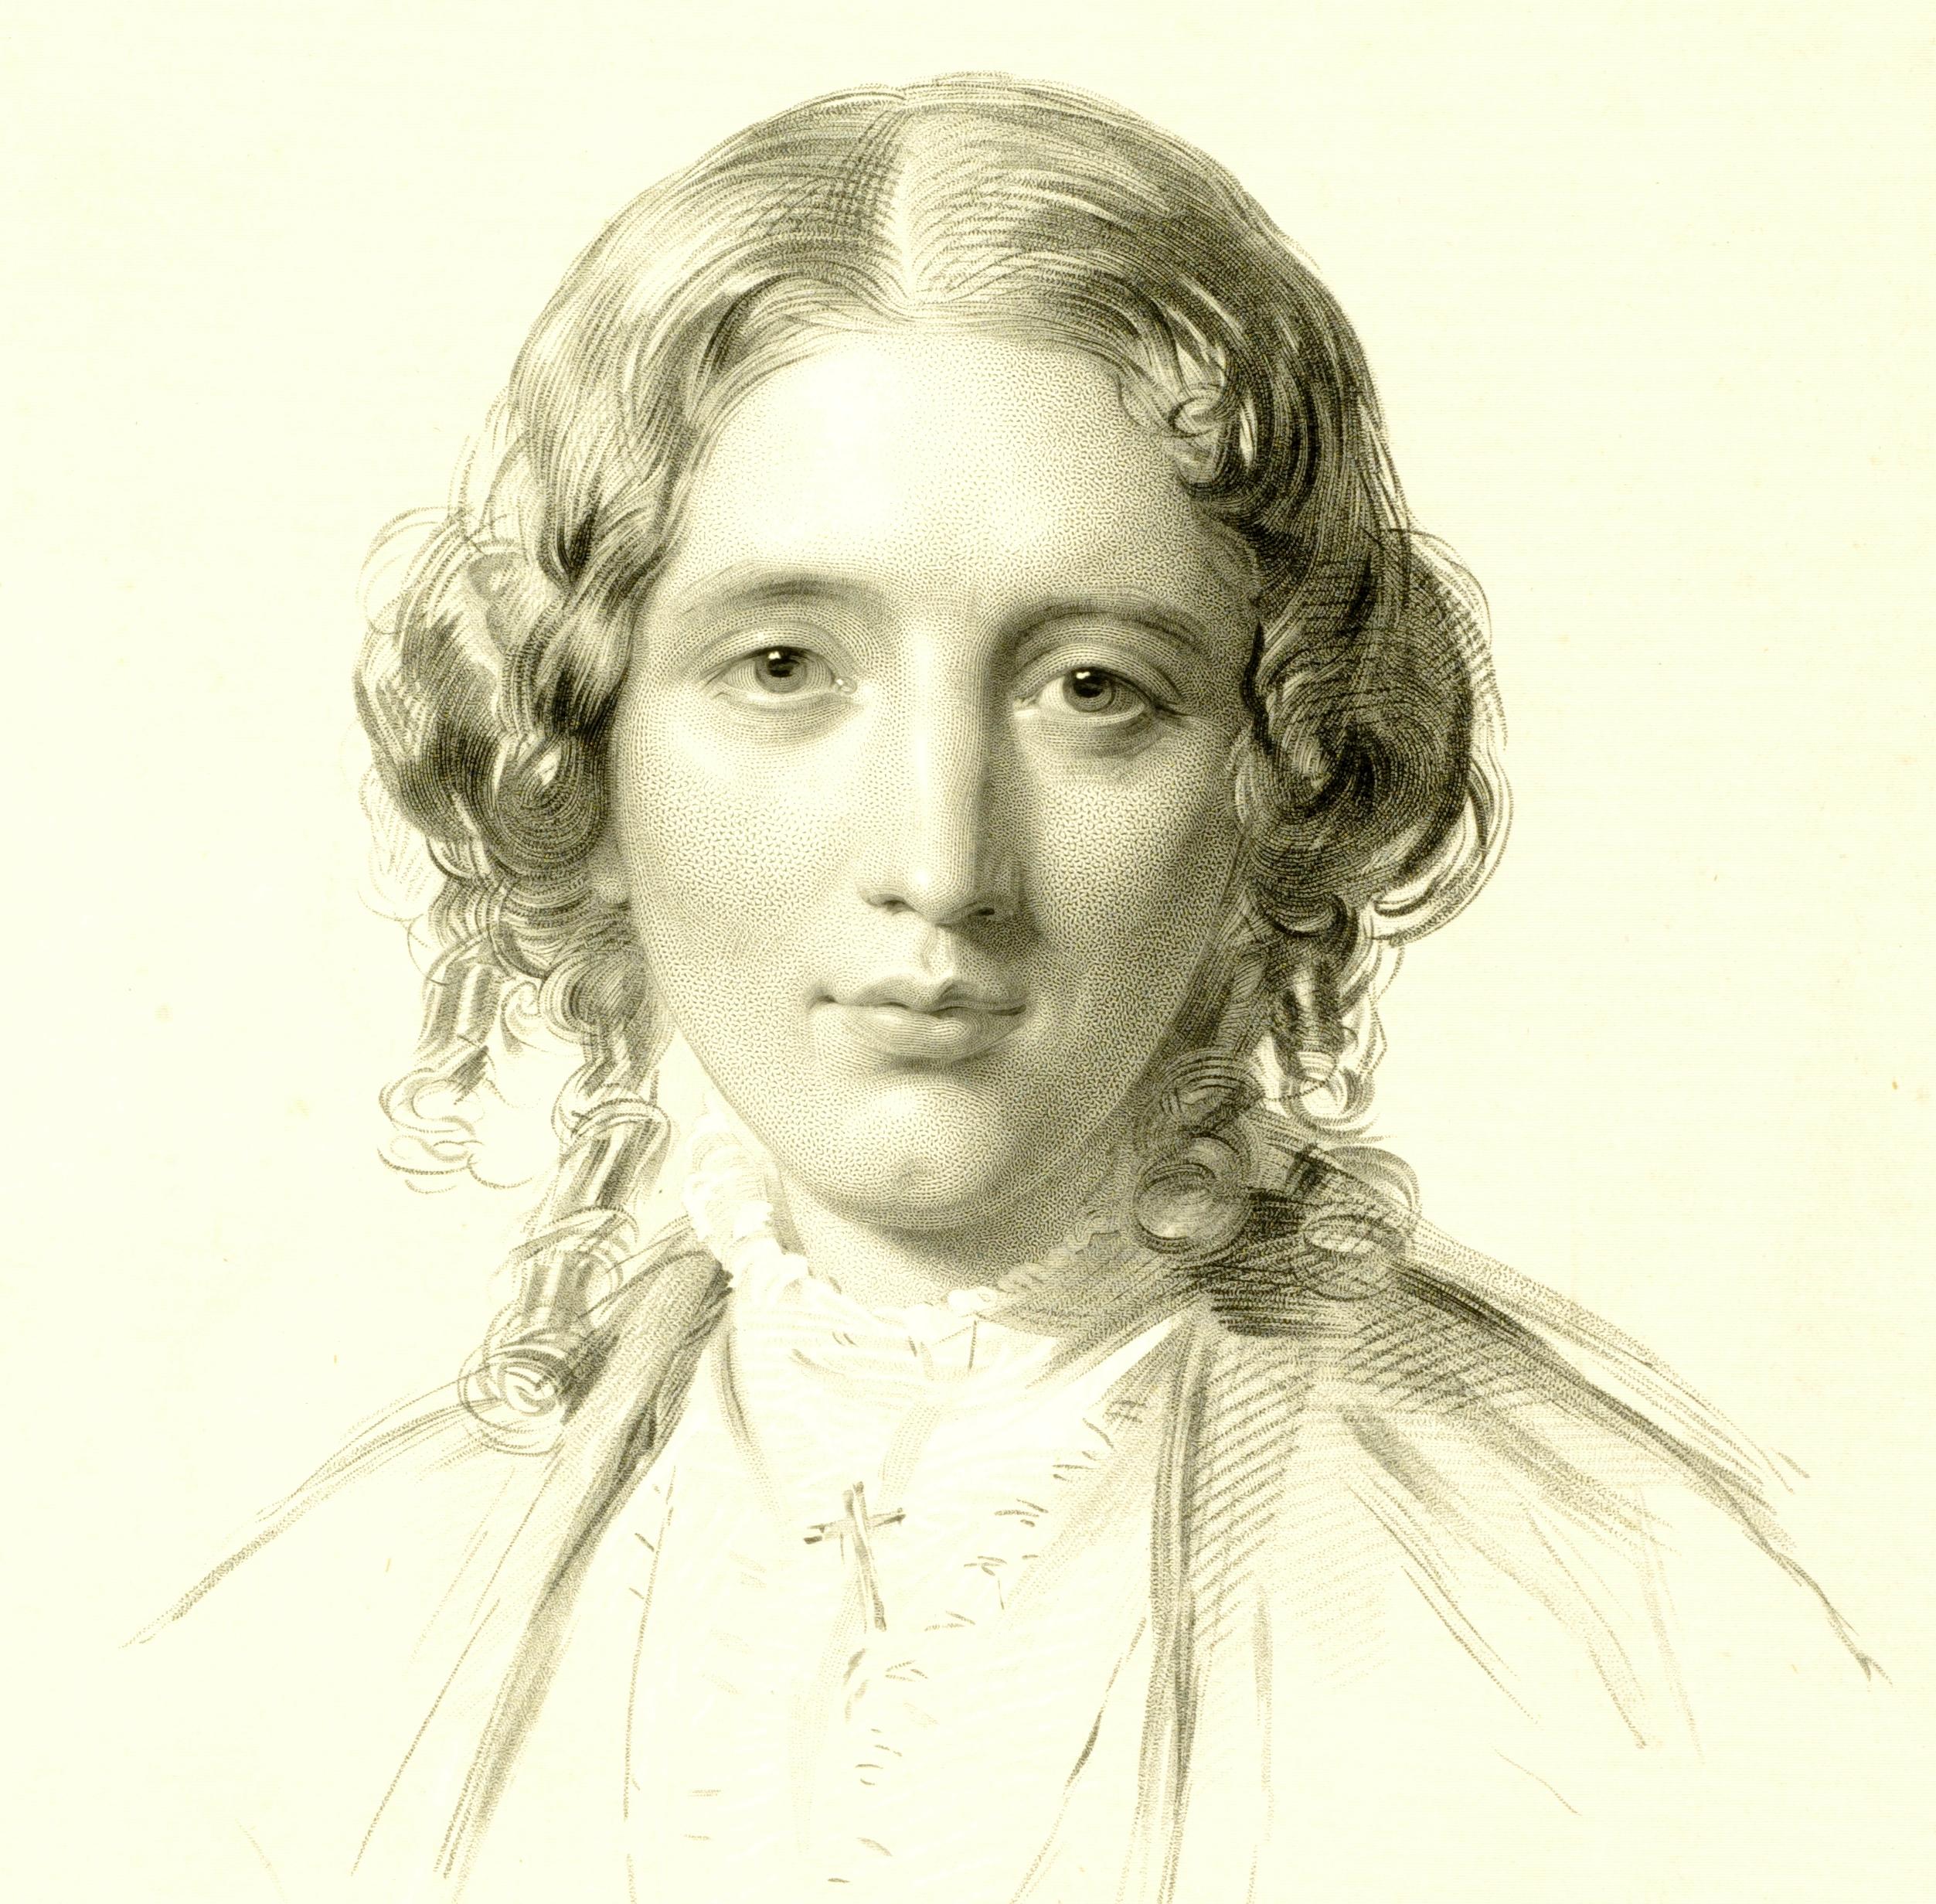 Research Paper on Harriet Beecher Stowe